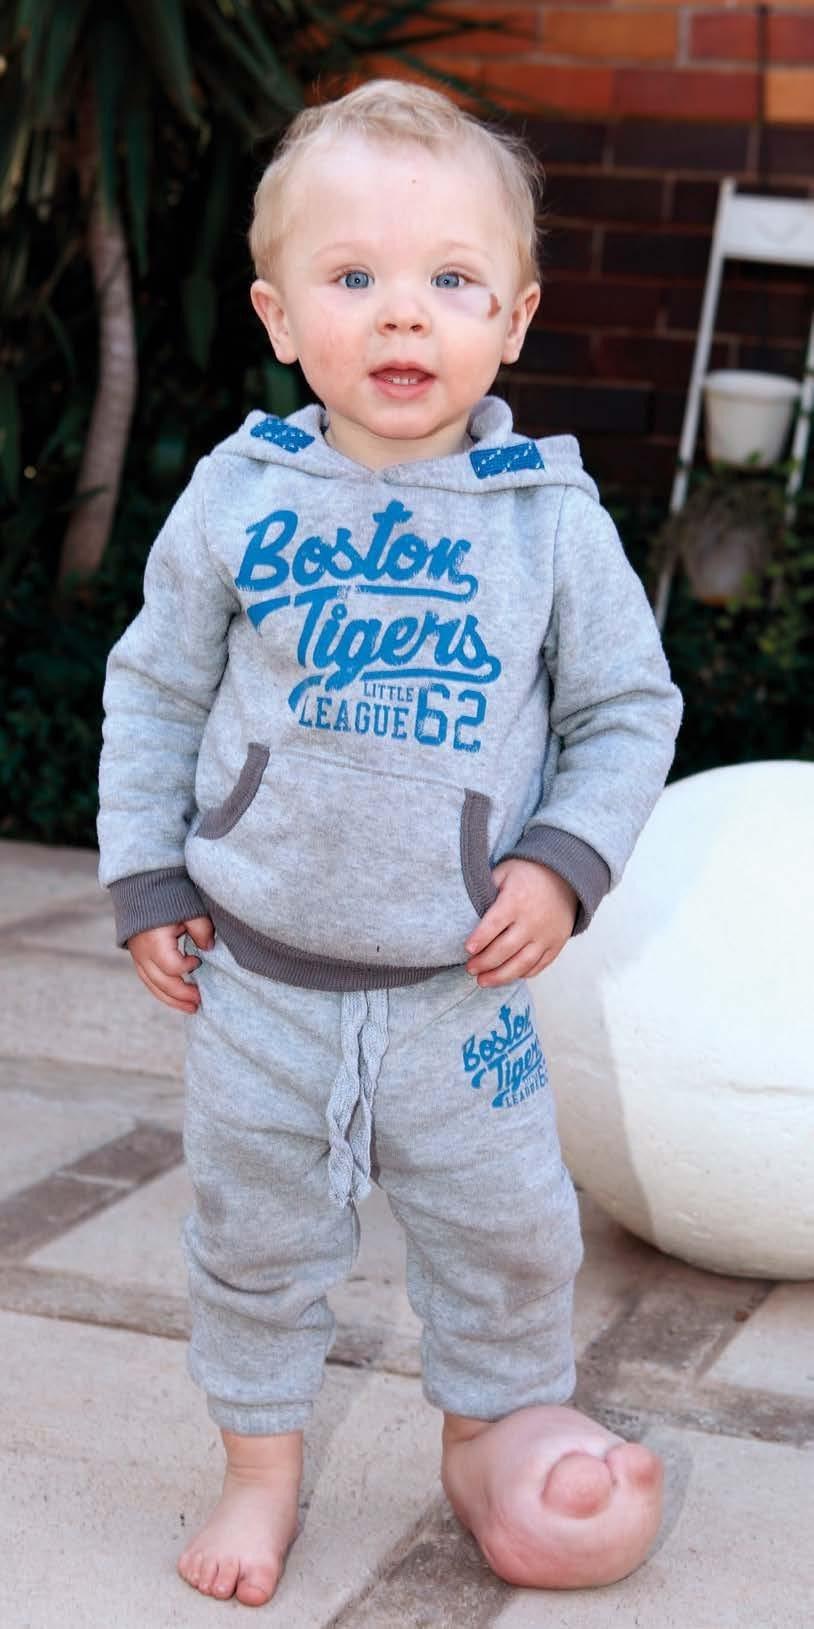 Die ondeunde klein Nathan Ungerer. Foto: Papi Mora